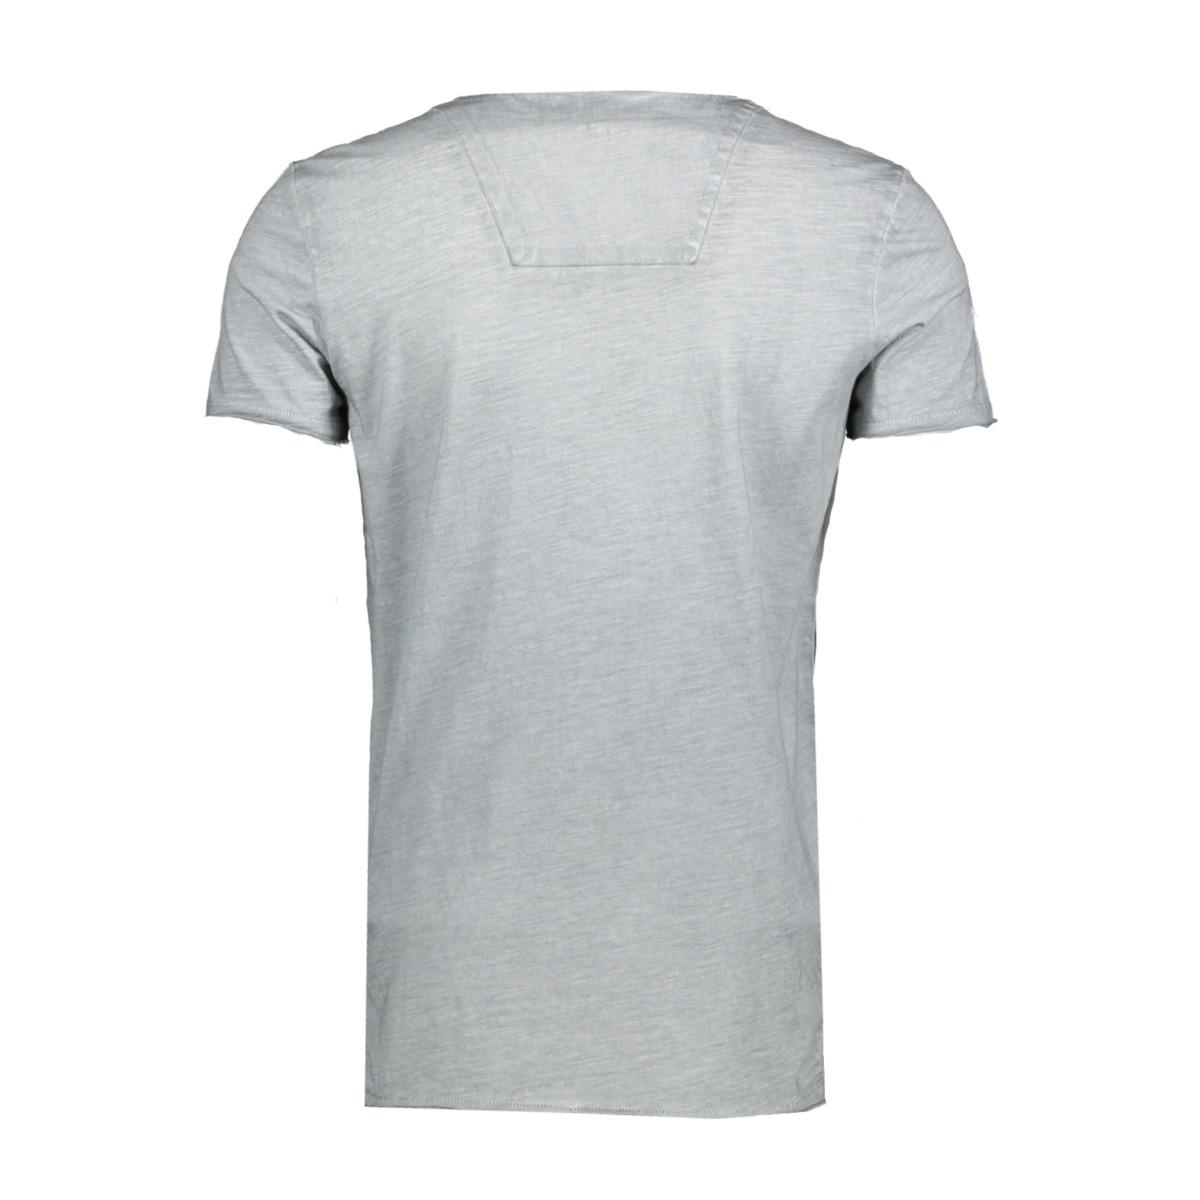 g71006 garcia t-shirt 318 high rise